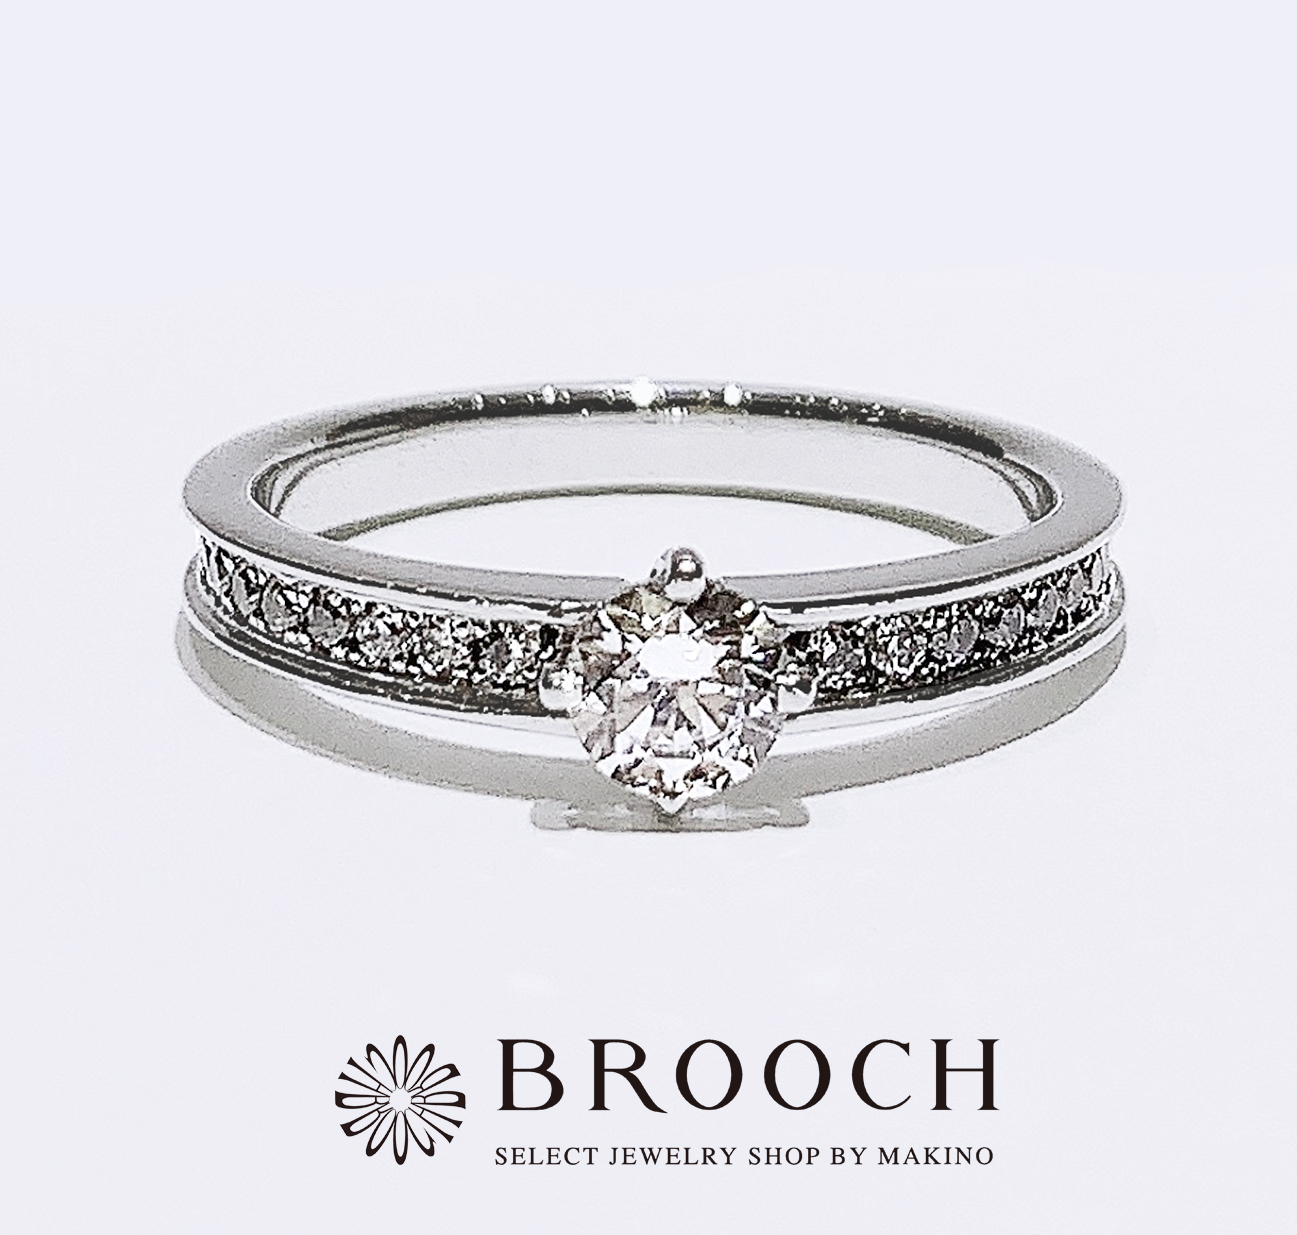 BROOCH 婚約指輪 エンゲージリング センターダイヤ1石ハーフエタニティデザイン